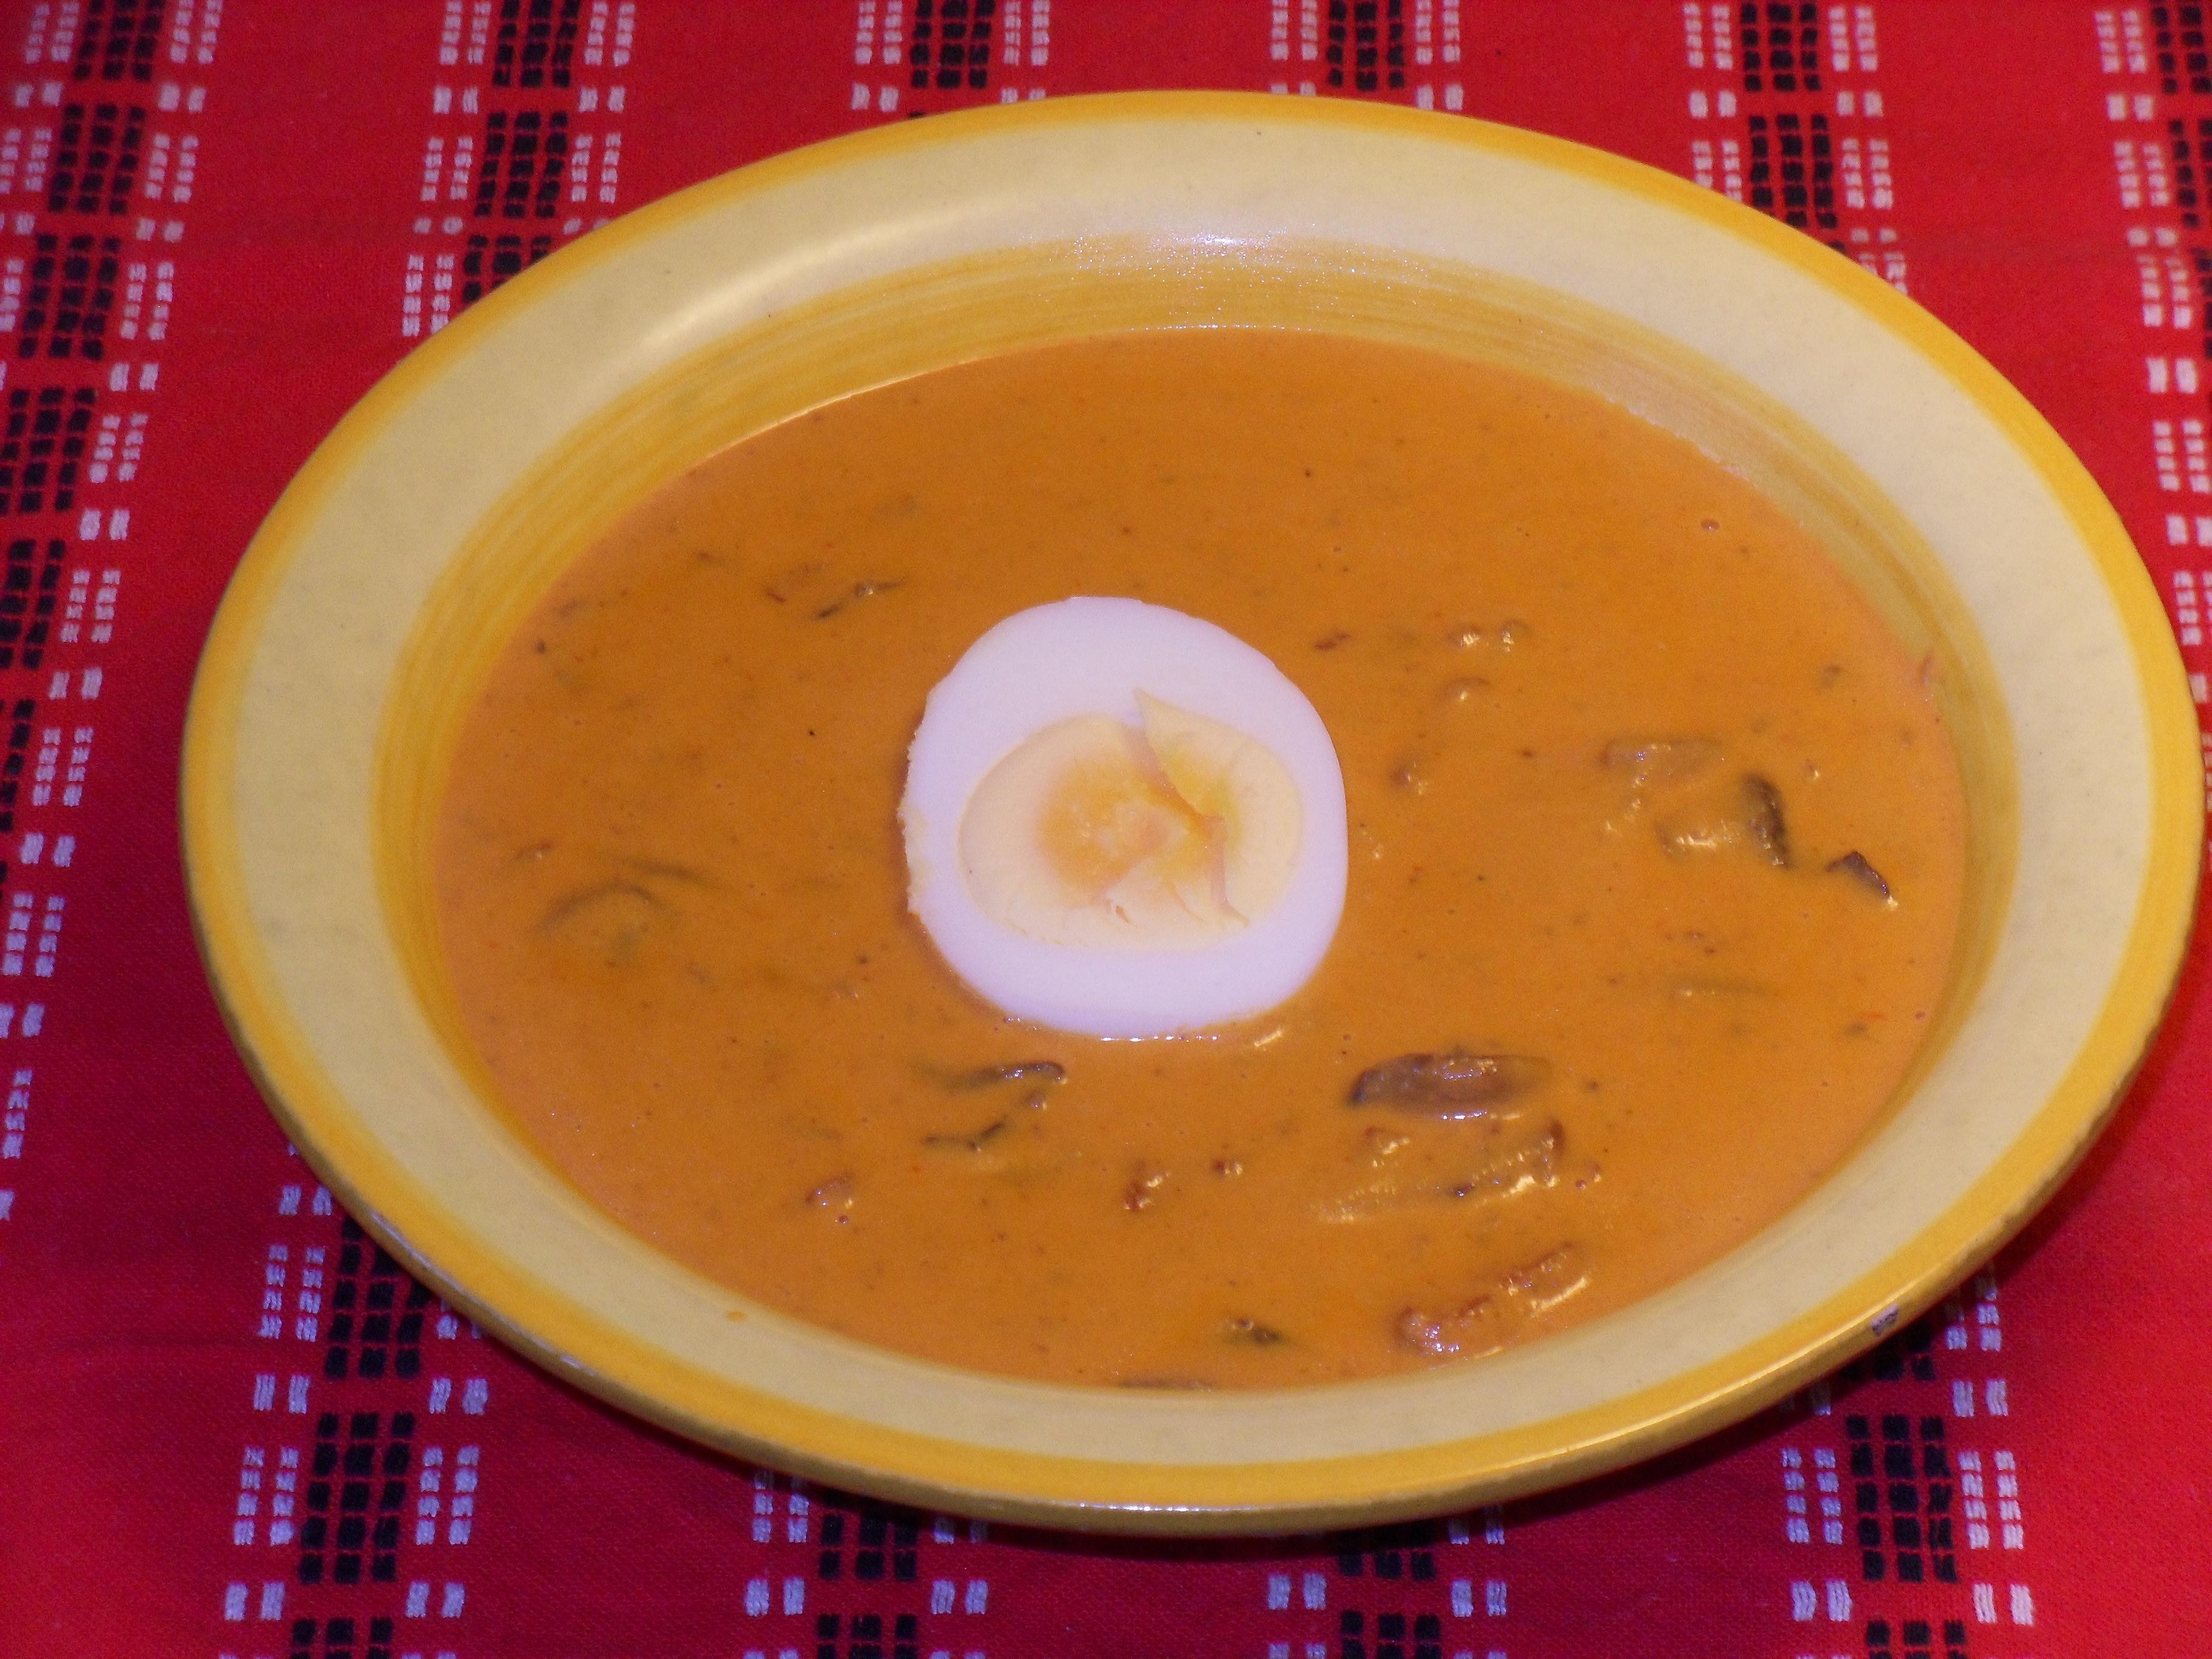 svamp soppa utan grädde